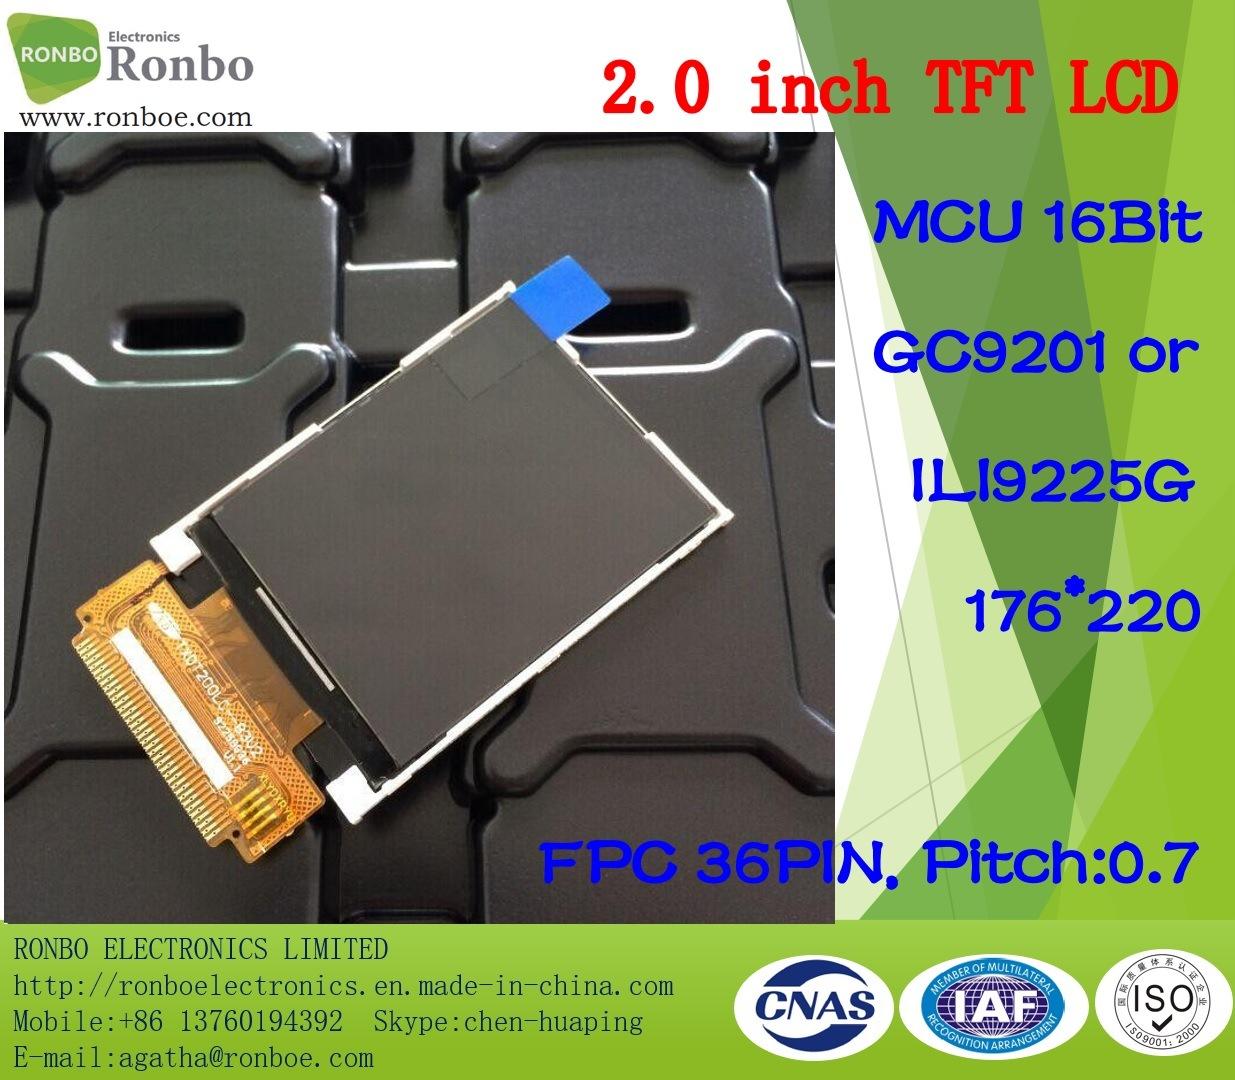 2.0 Inch 176*220 MCU 16bit 36pin TFT LCD Panel, Option Touch Screen